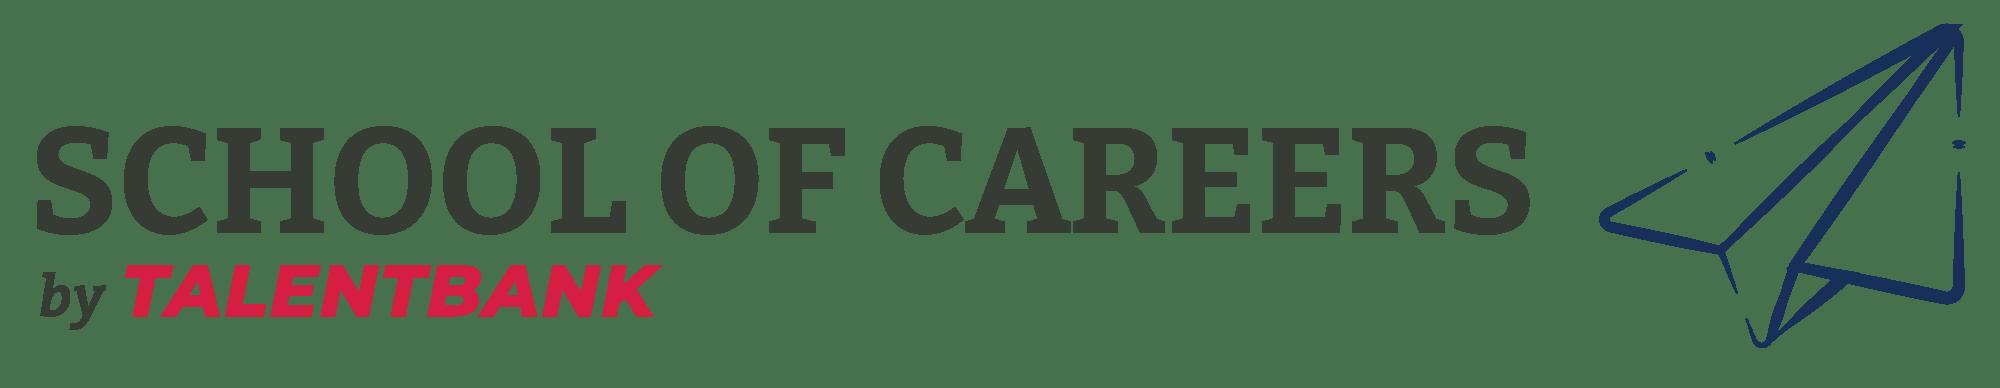 School of Careers by Talentbank